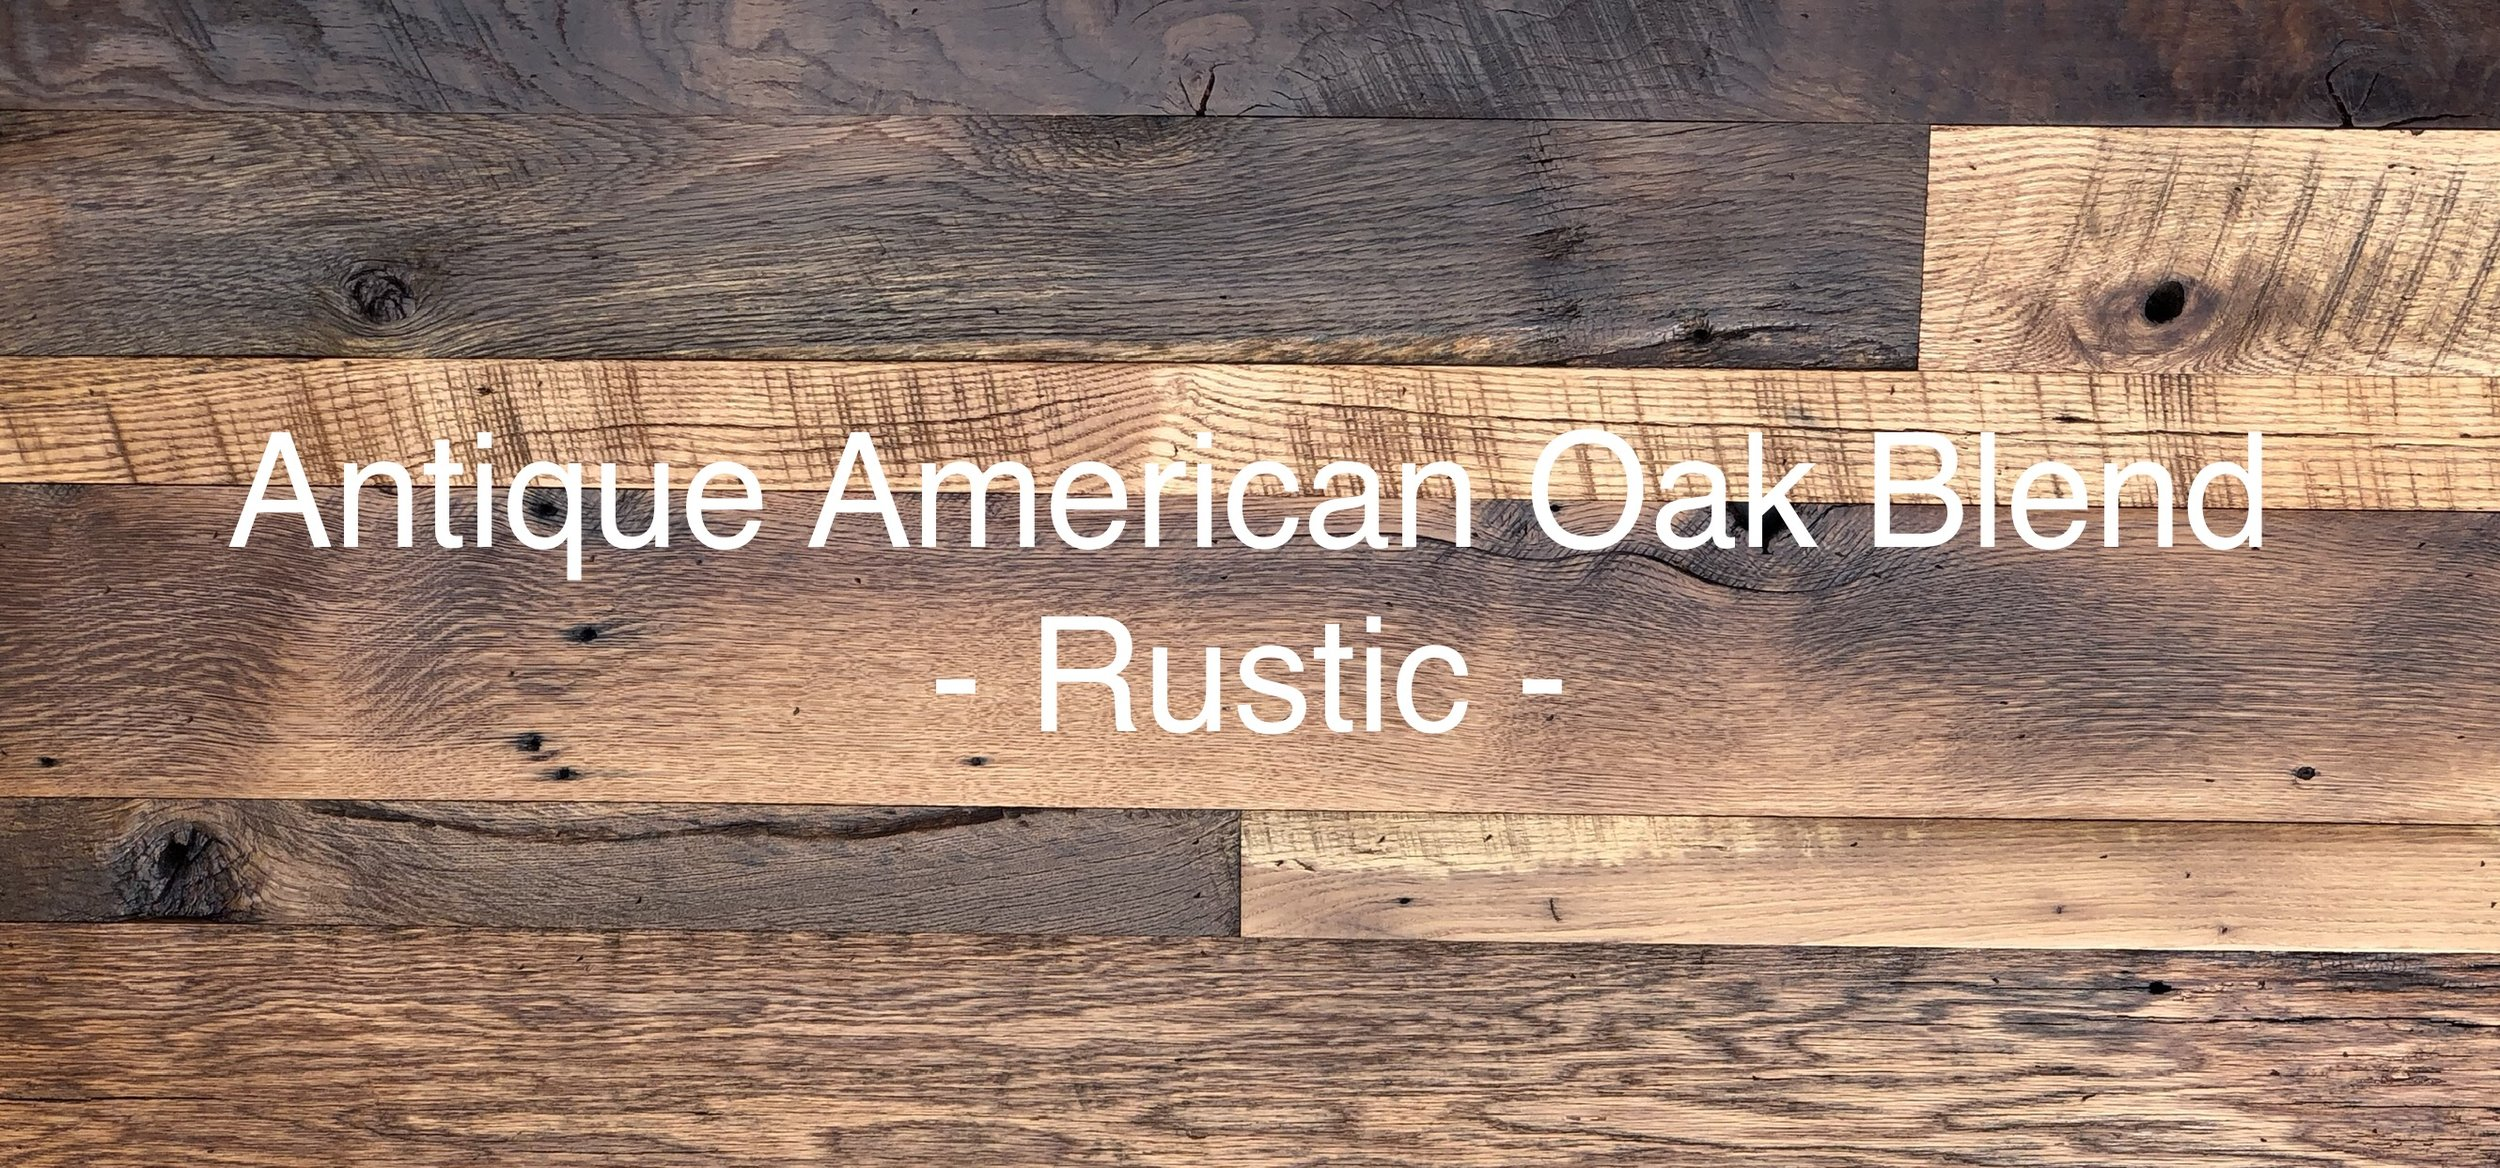 ANTIQUE AMERICAN OAK - RUSTIC -